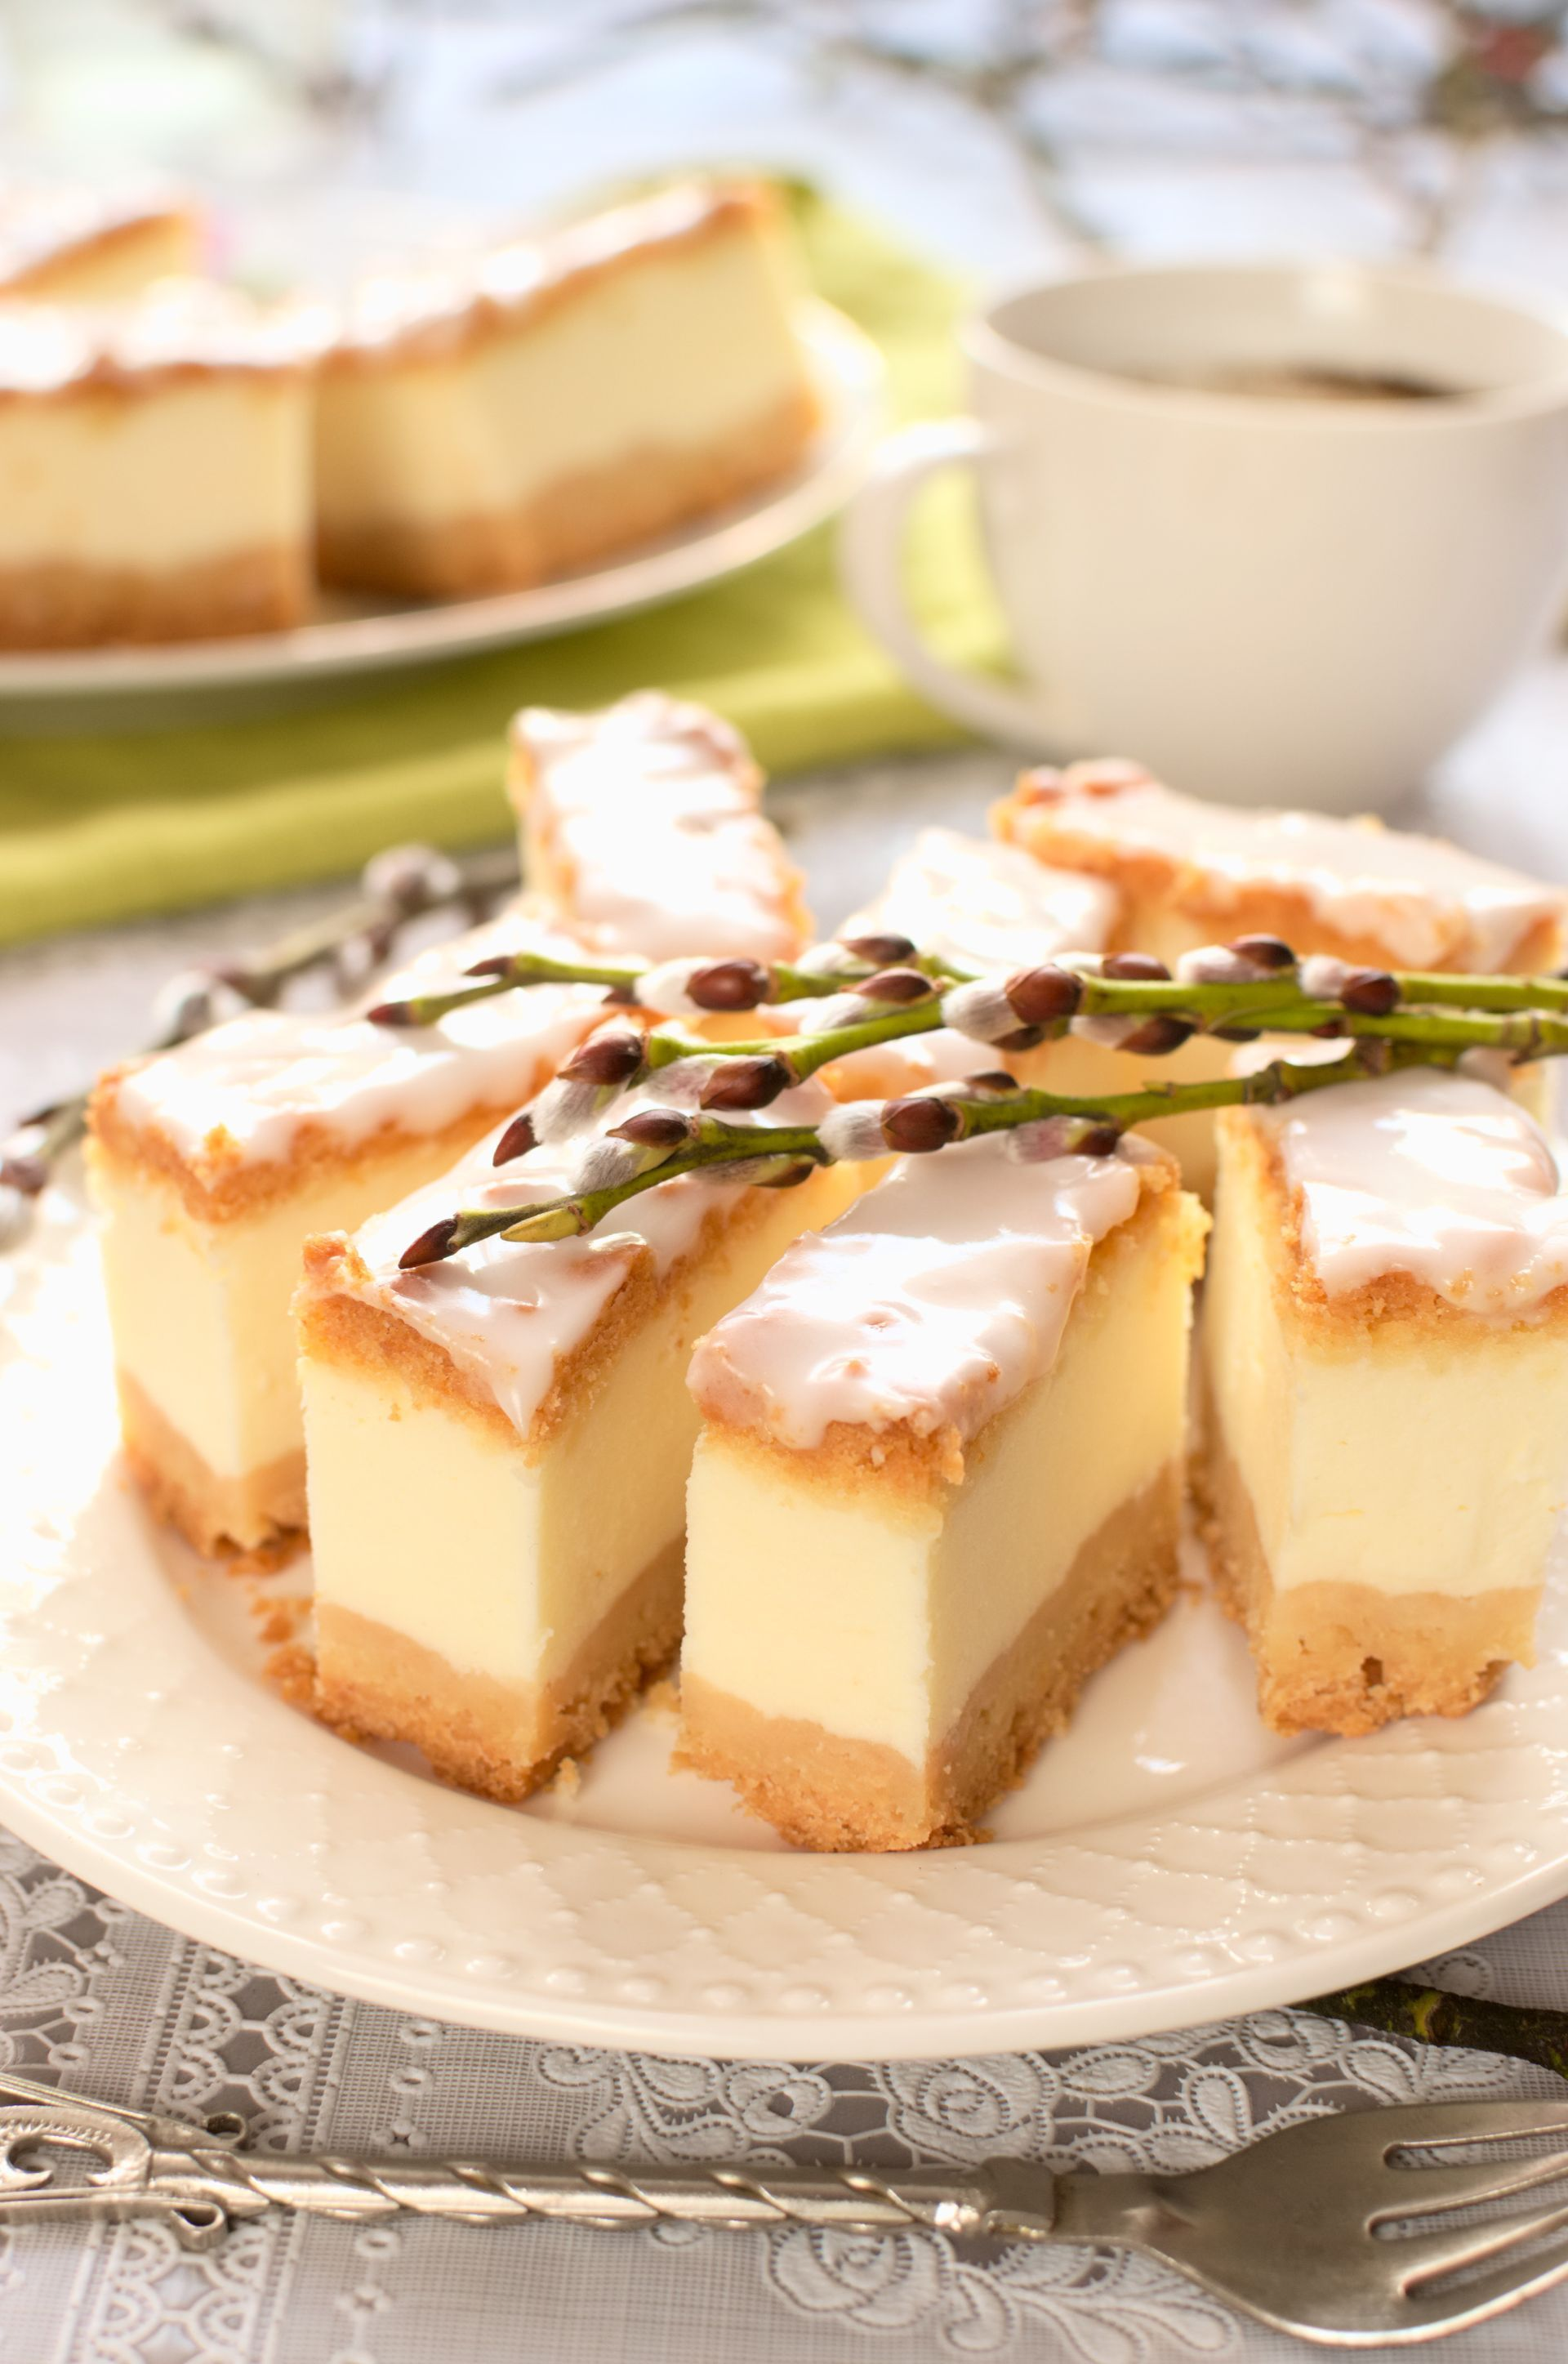 Sernik Bialy Puch Na Samych Bialkach Dessert Cake Recipes Food Baking